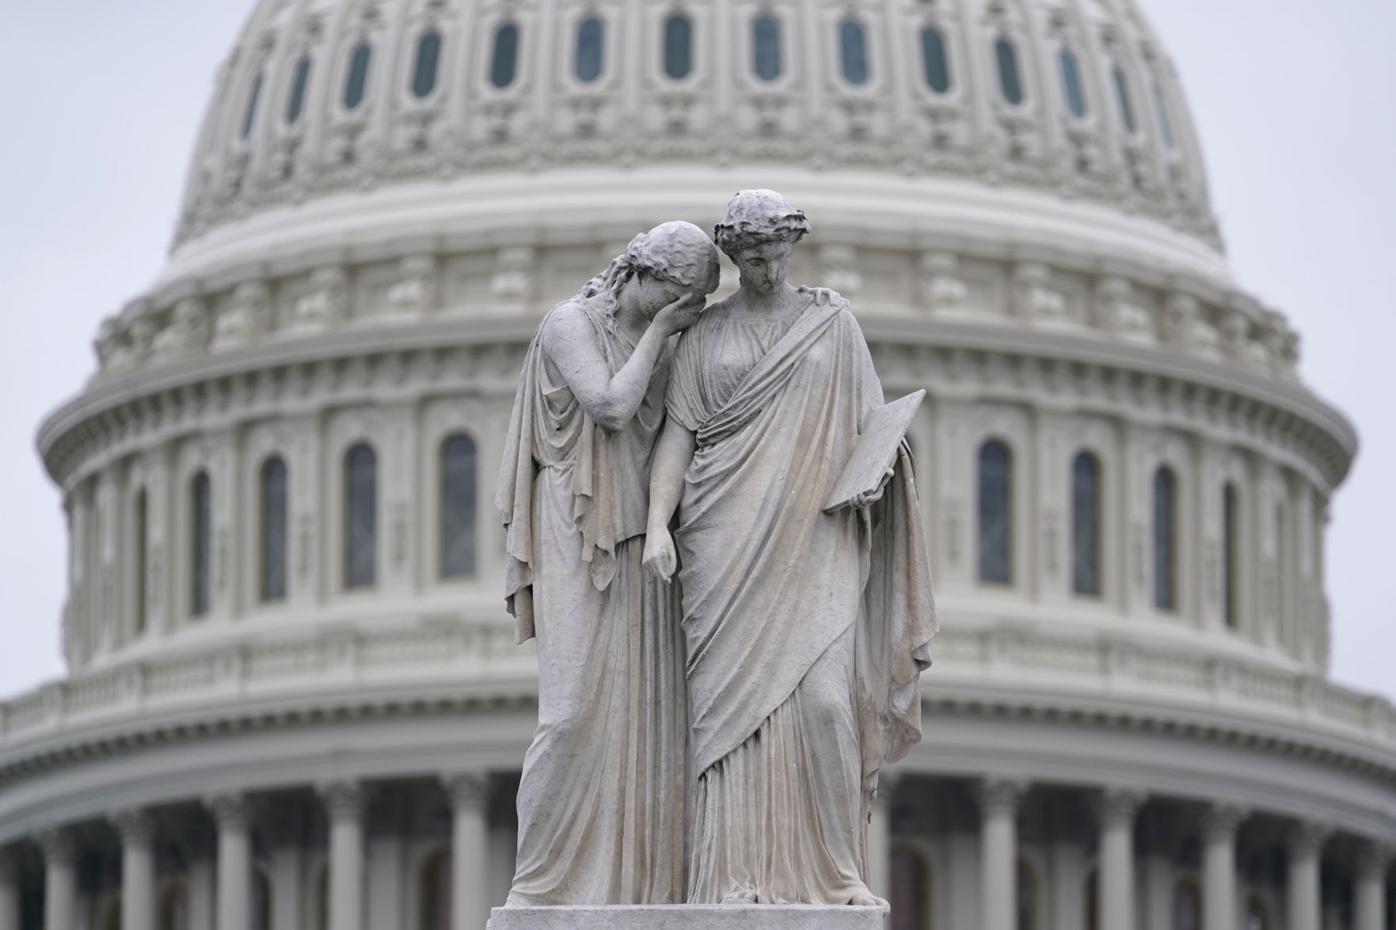 Capitol Breach Making Sense of It